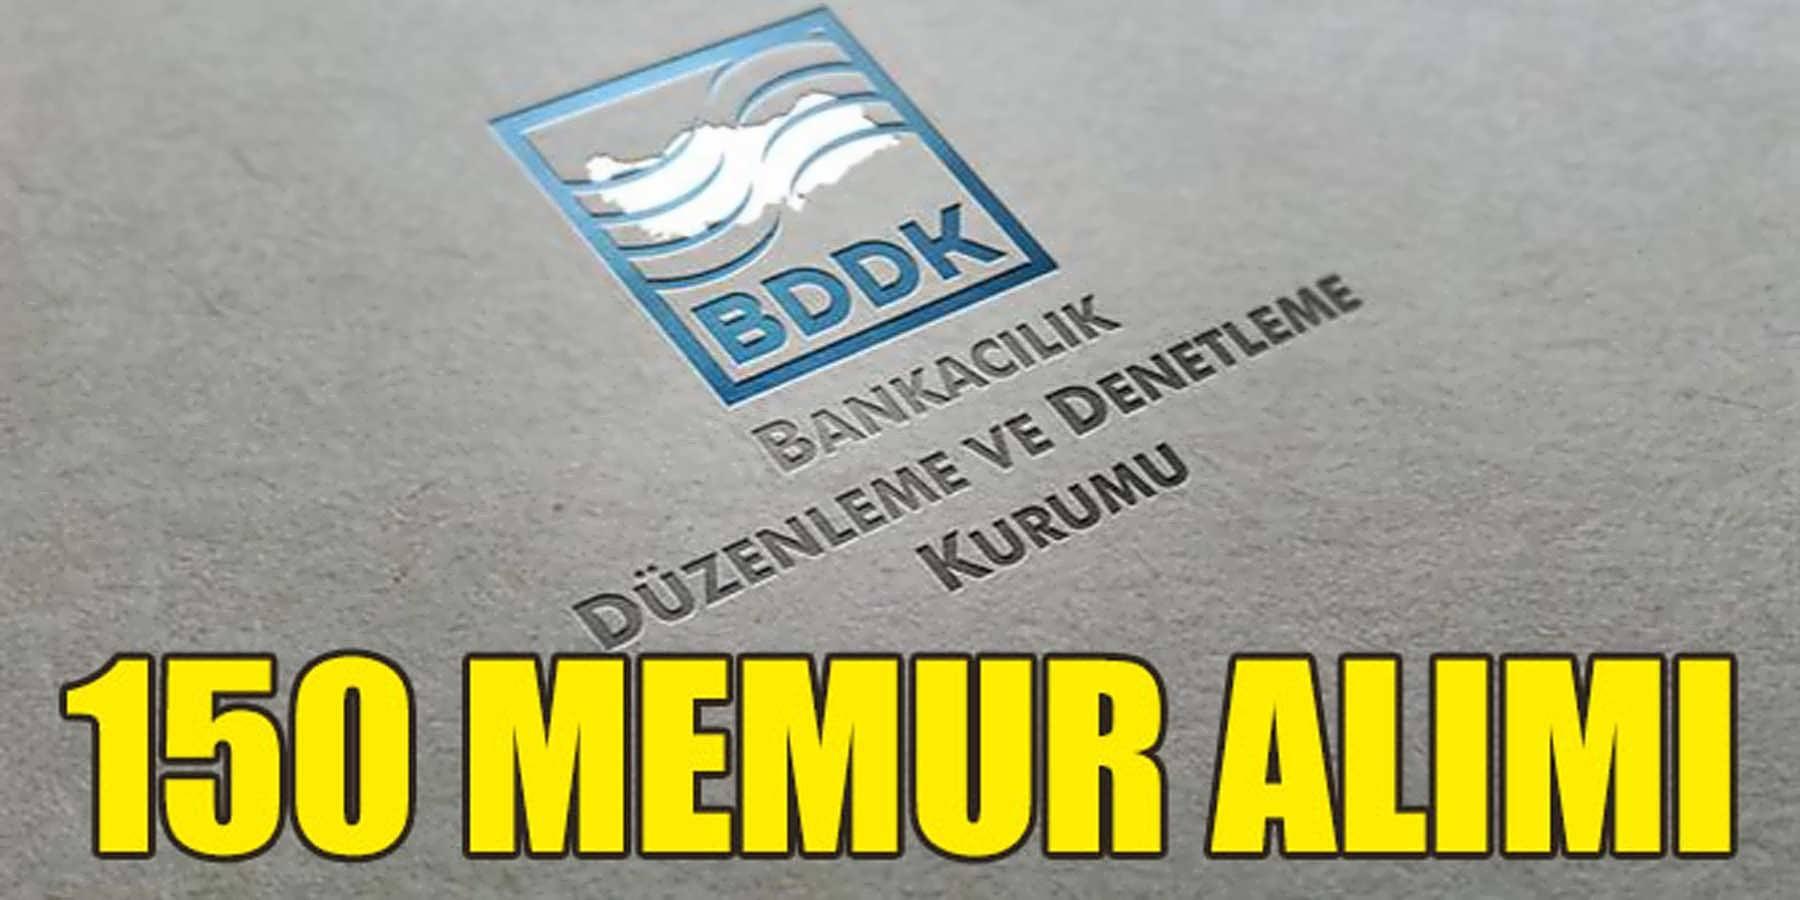 BDDK 150 Kamu Personeli Alımı (Meslek Personeli)